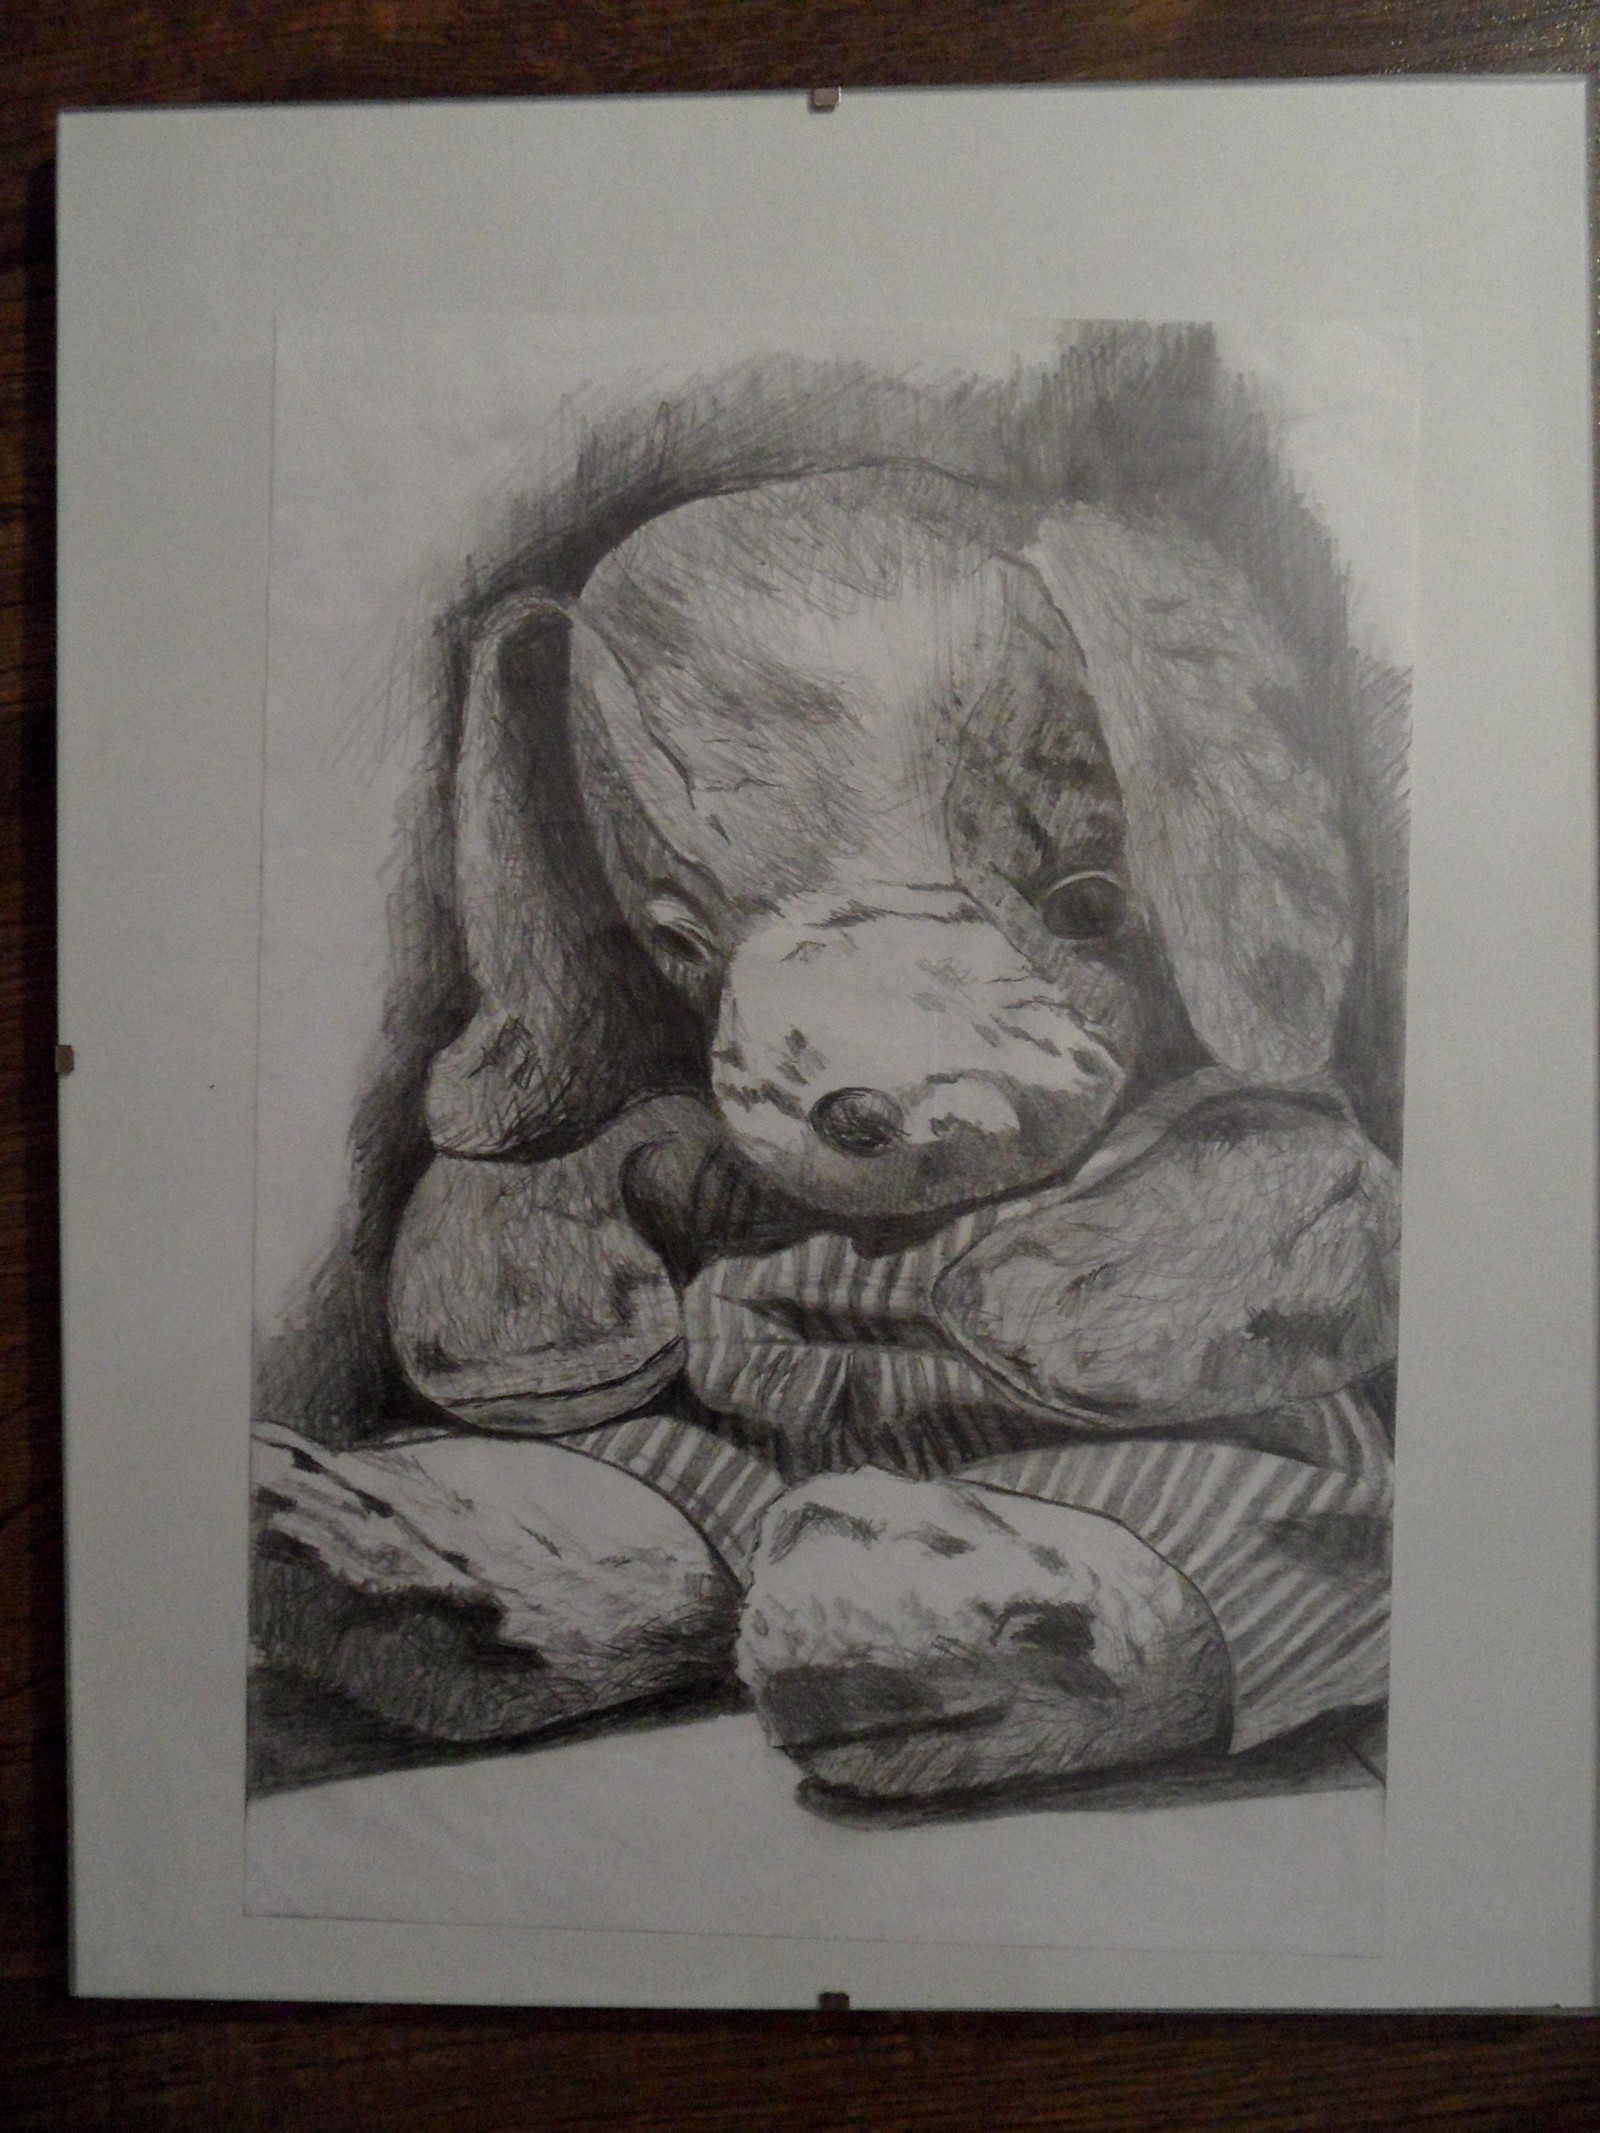 Kresba Tuzkou Zbozi Prodejce Kick Art Fler Cz